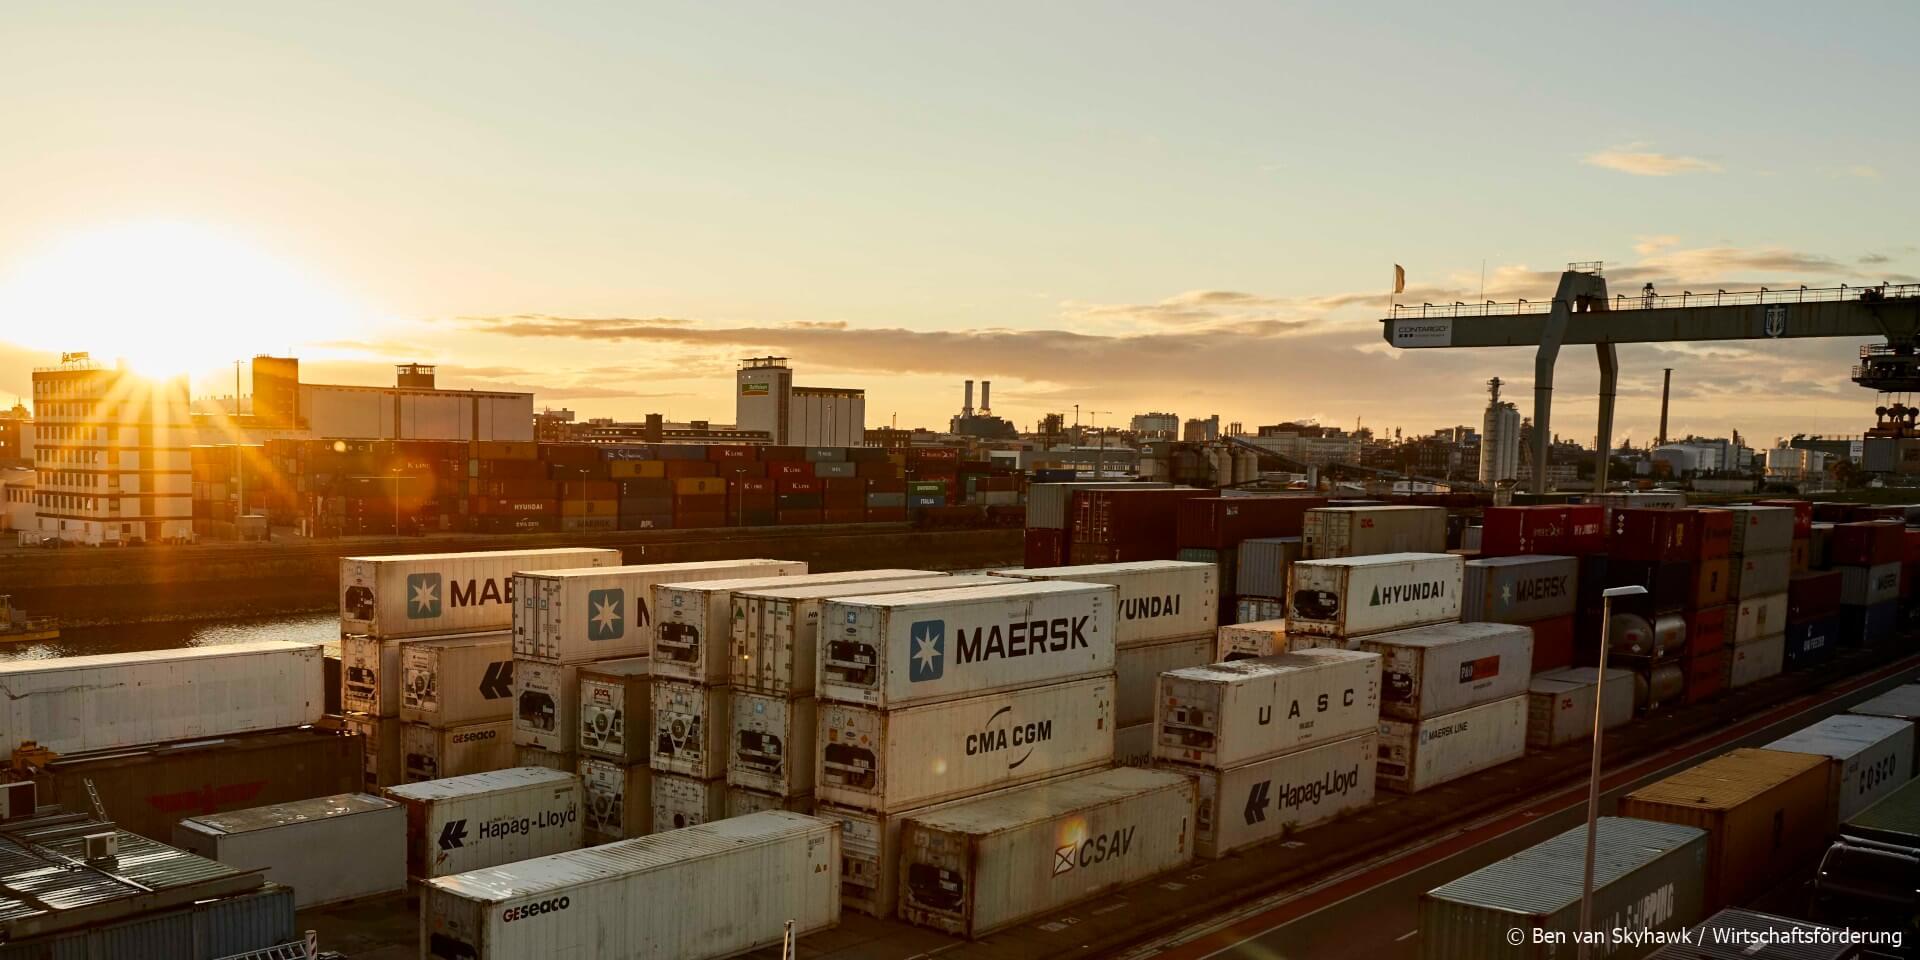 Container port Mannheim